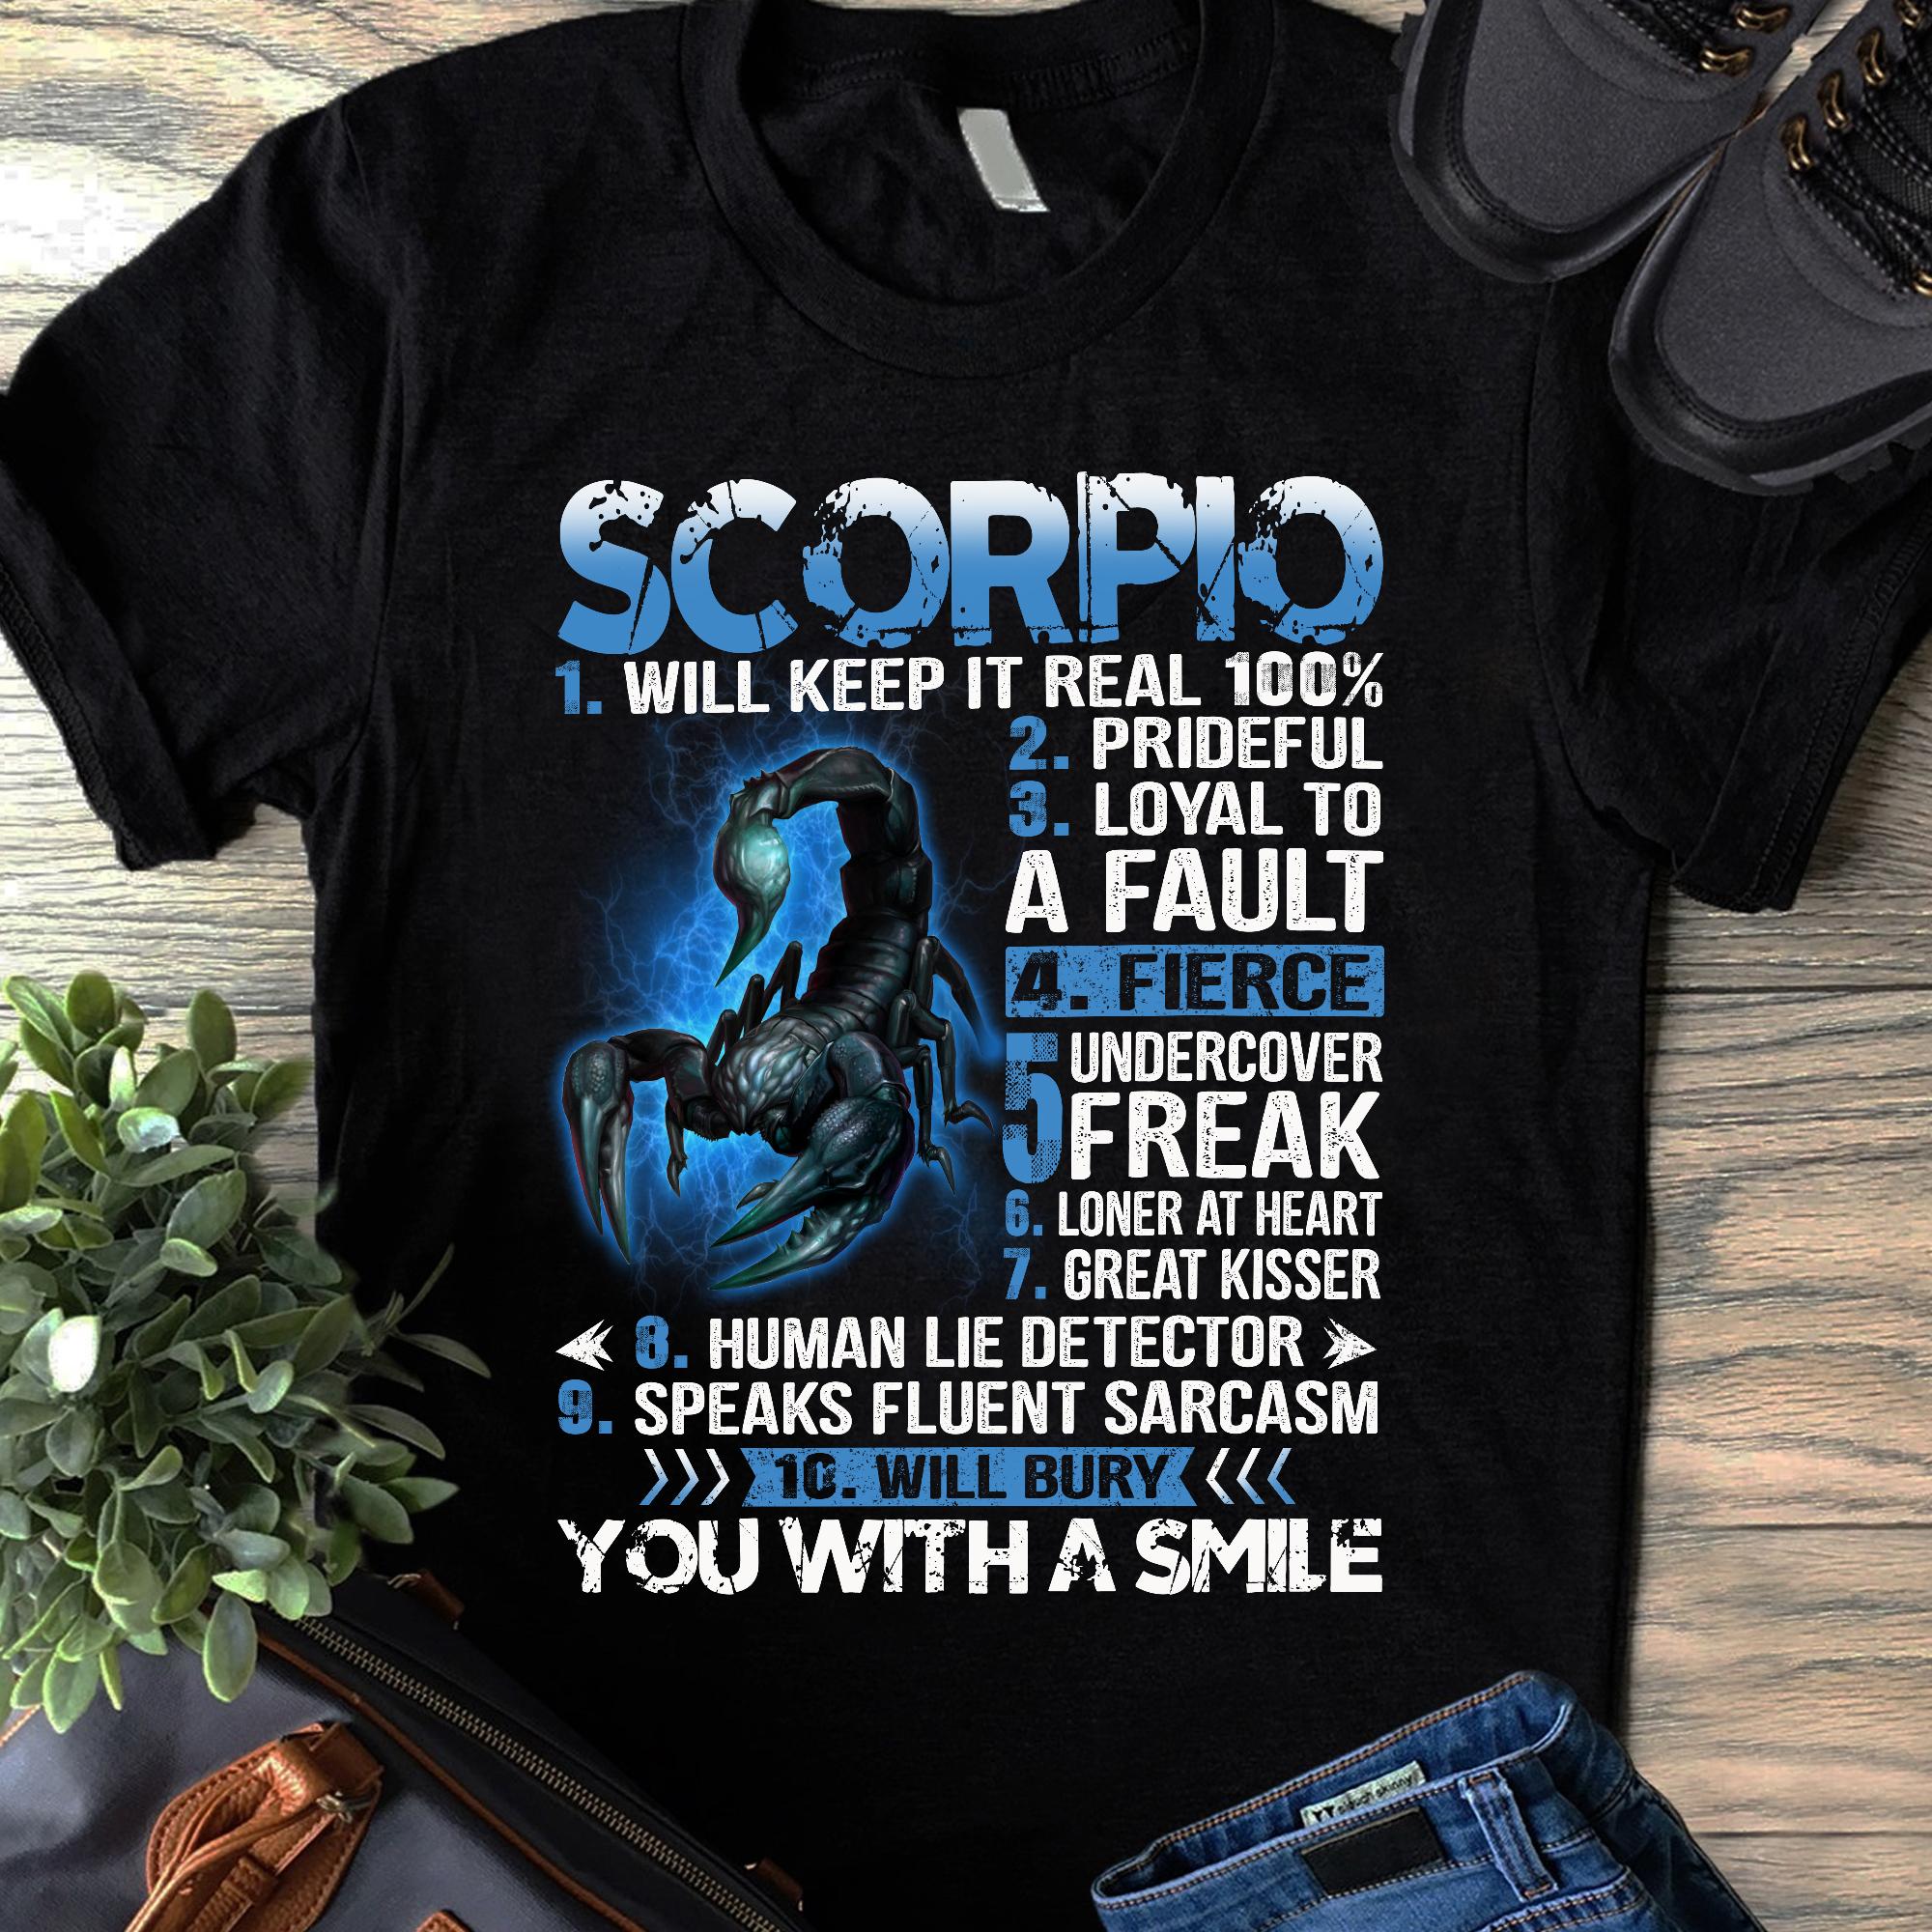 Scorpio Will Keep It Real 100% Shirt